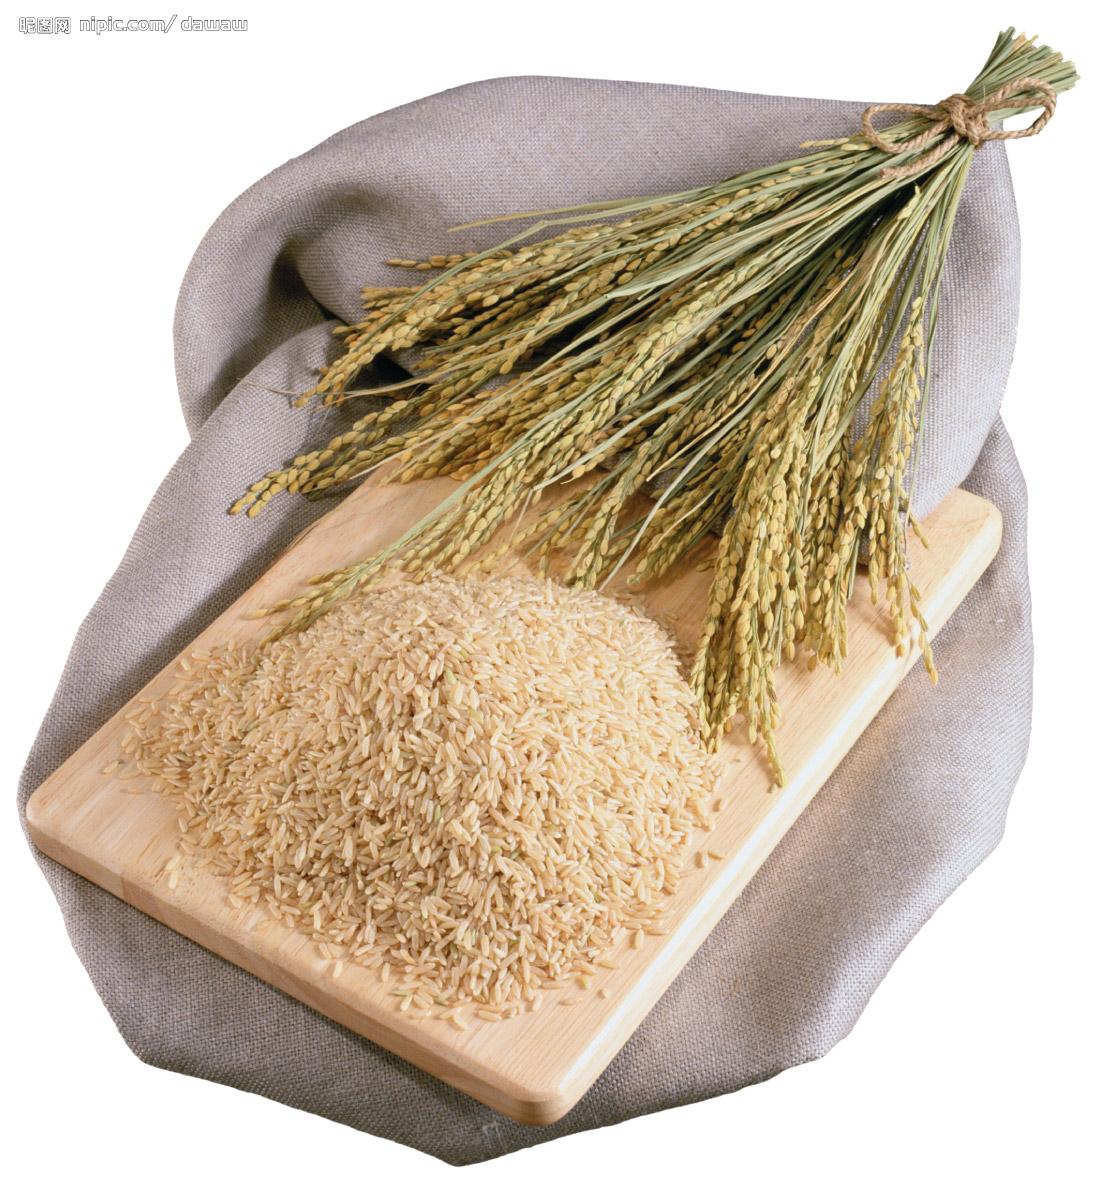 apports nutritionnels riz bio acheter part 2 riz bio. Black Bedroom Furniture Sets. Home Design Ideas